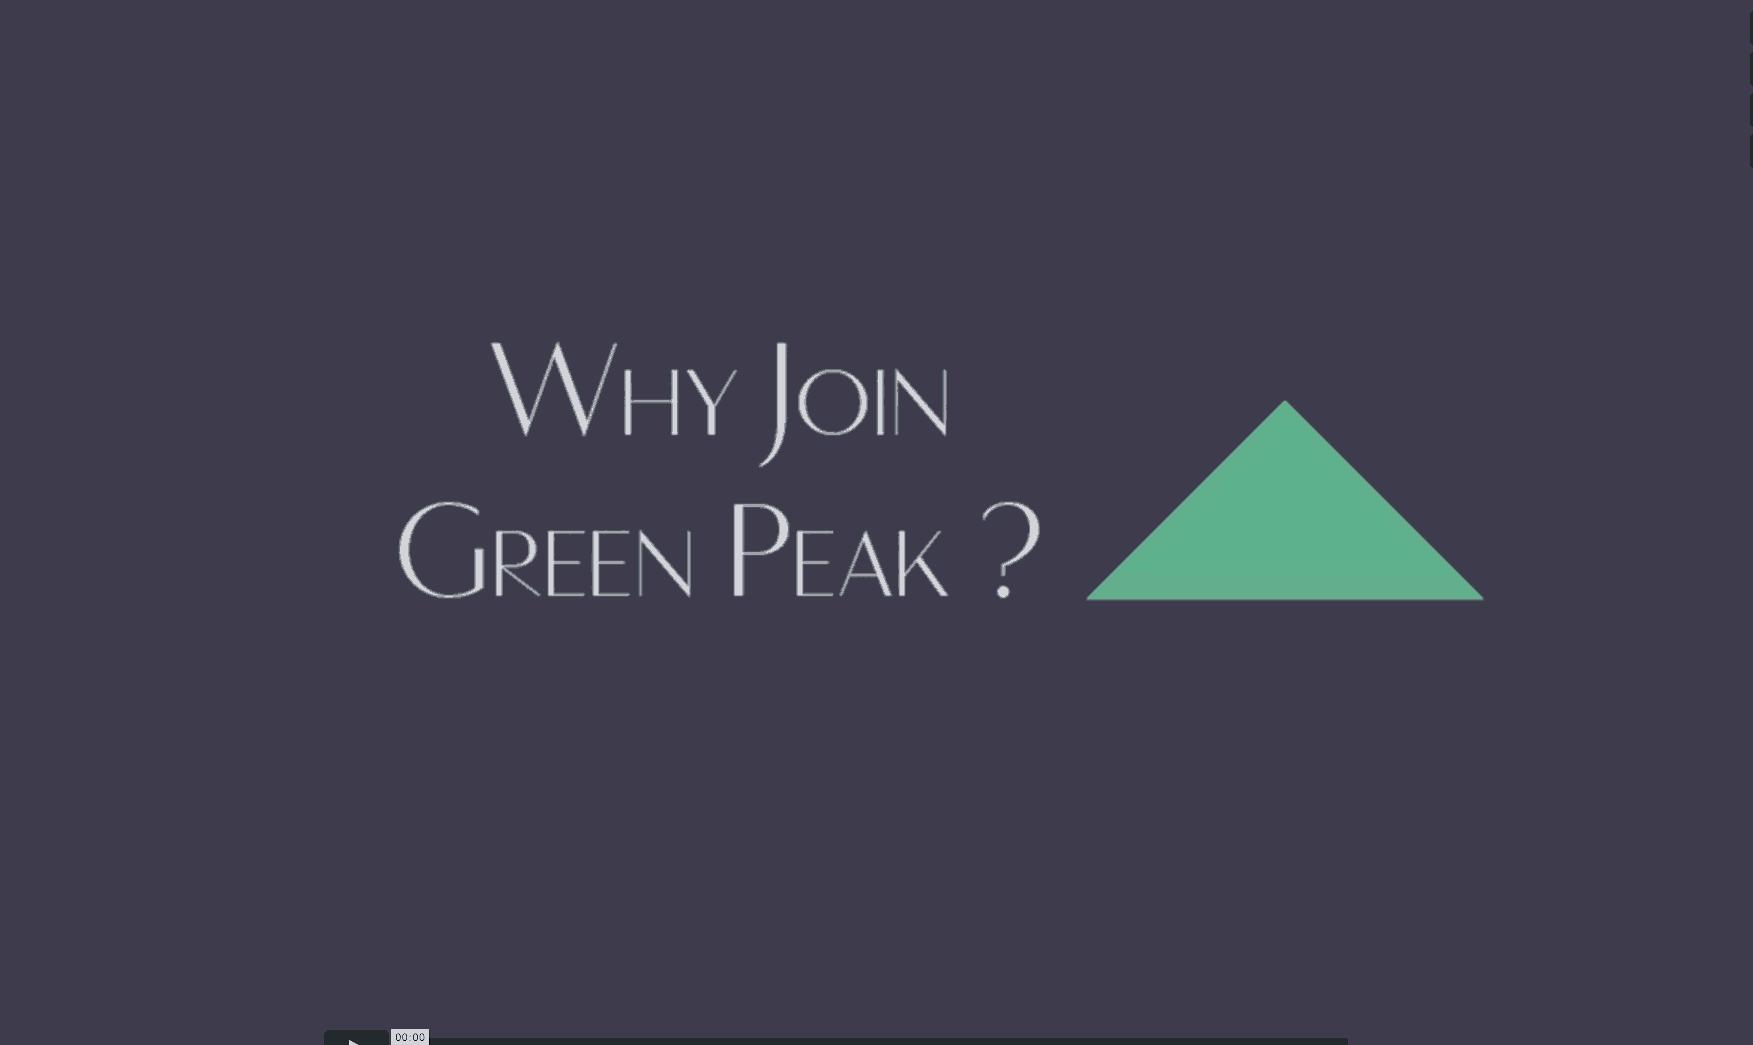 WhyJoinGreenPeak